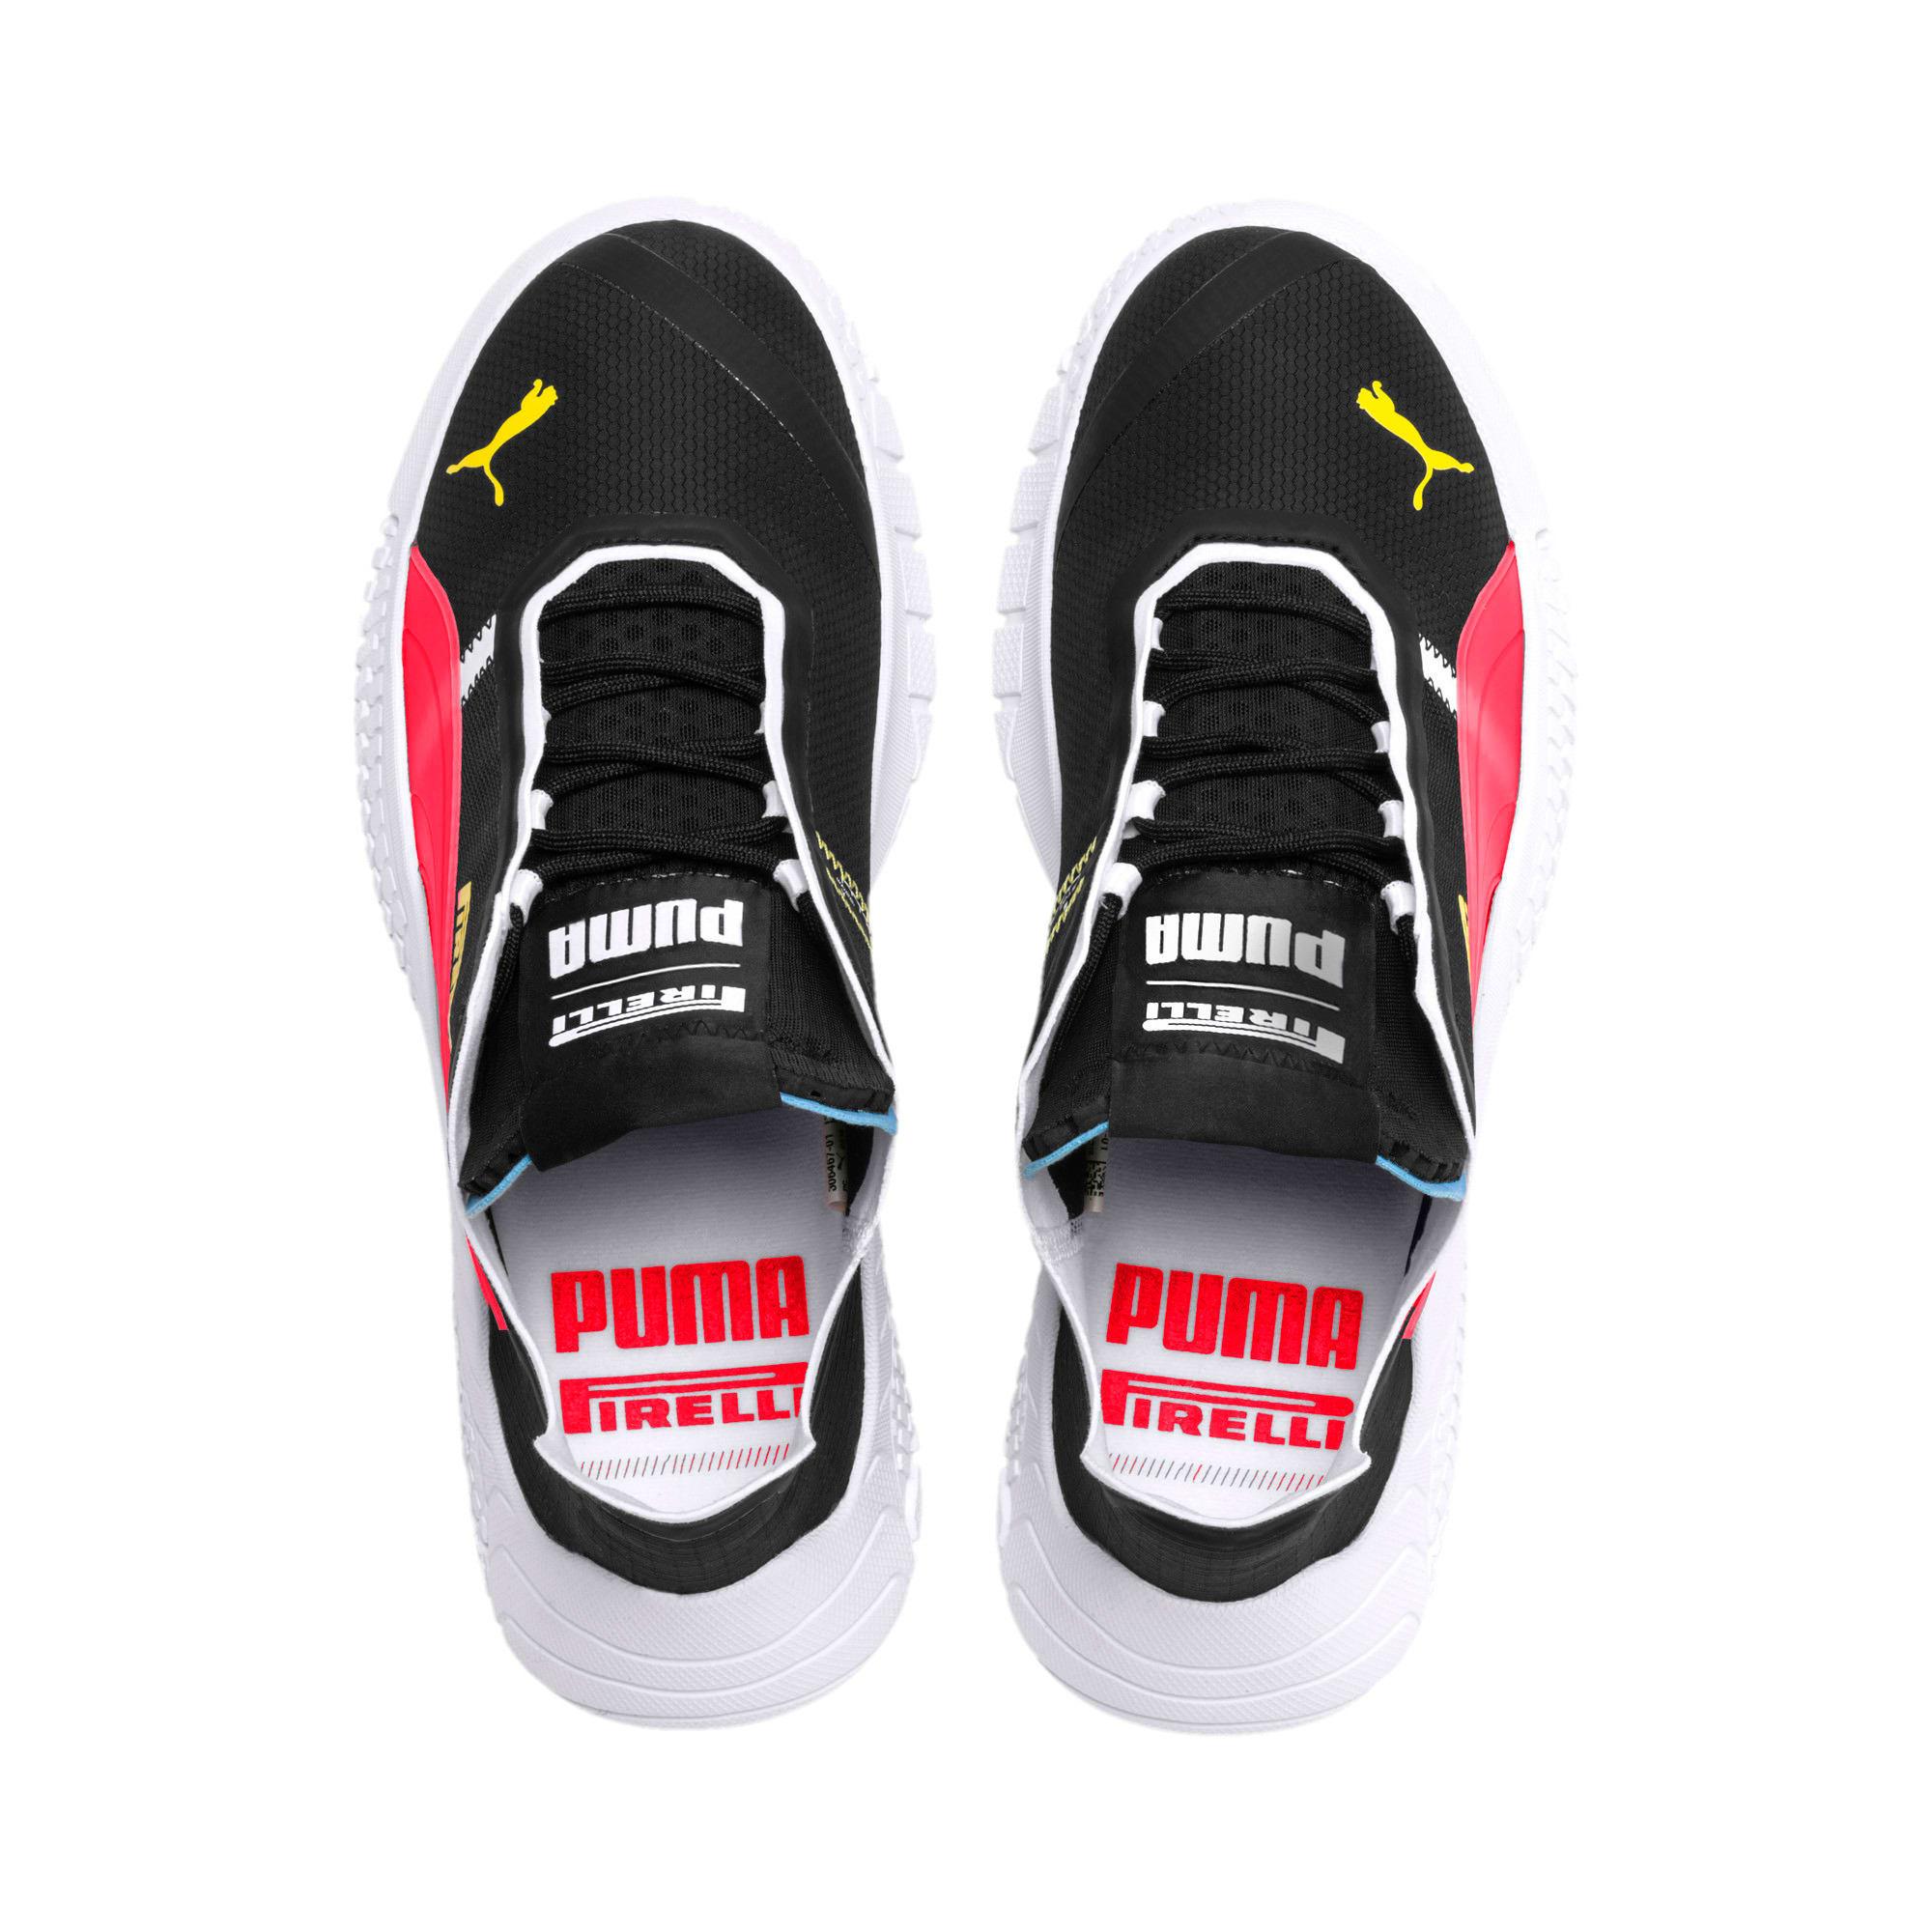 Thumbnail 8 of Replicat-X Pirelli v2 Motorsport Shoes, Black-Puma Red- White, medium